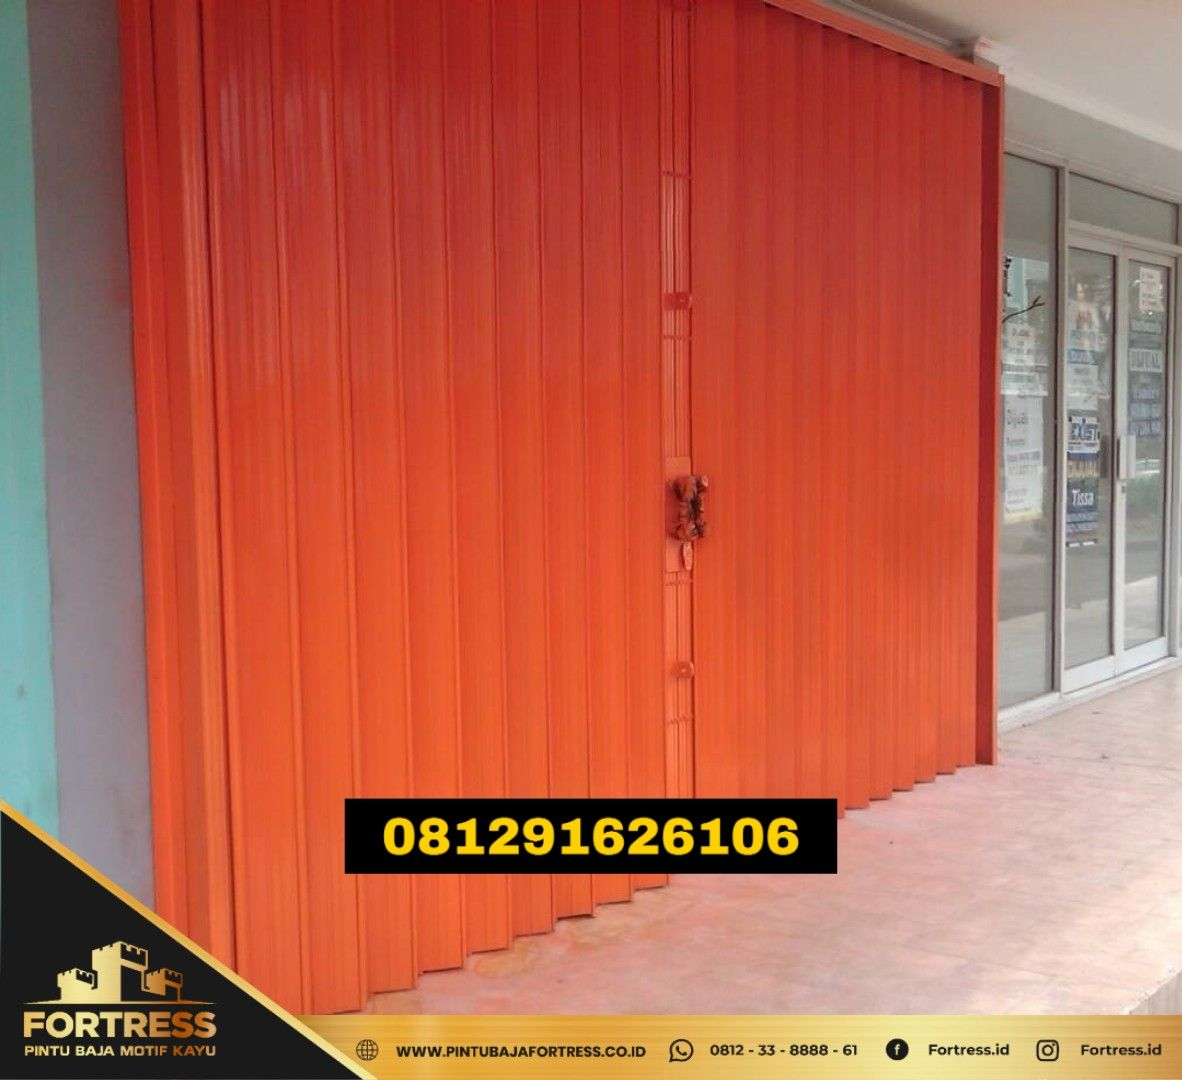 0812-3388-8861 (FORTRESS), Folding Gate Semarang Blitar Tang …